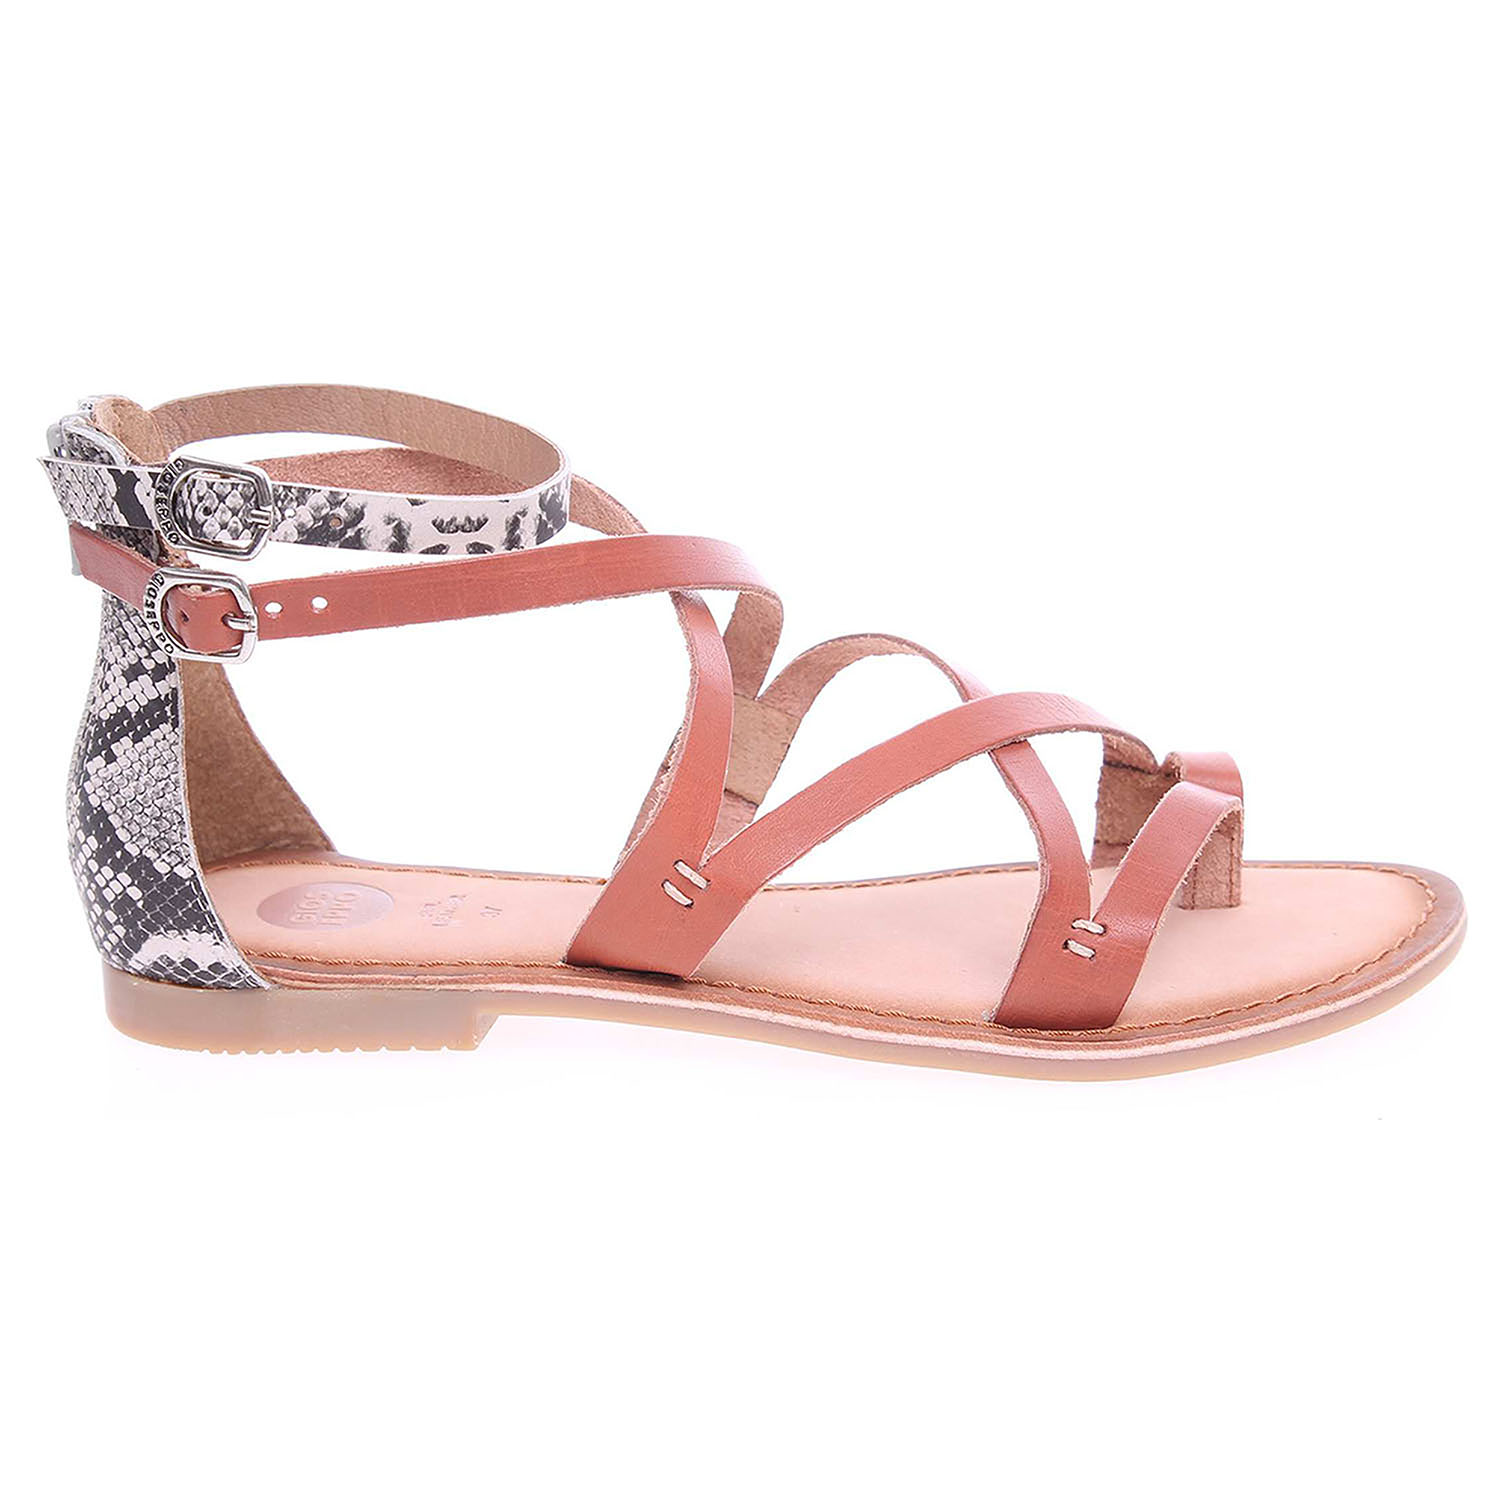 Gioseppo Arnay dámské sandály hnědé 41